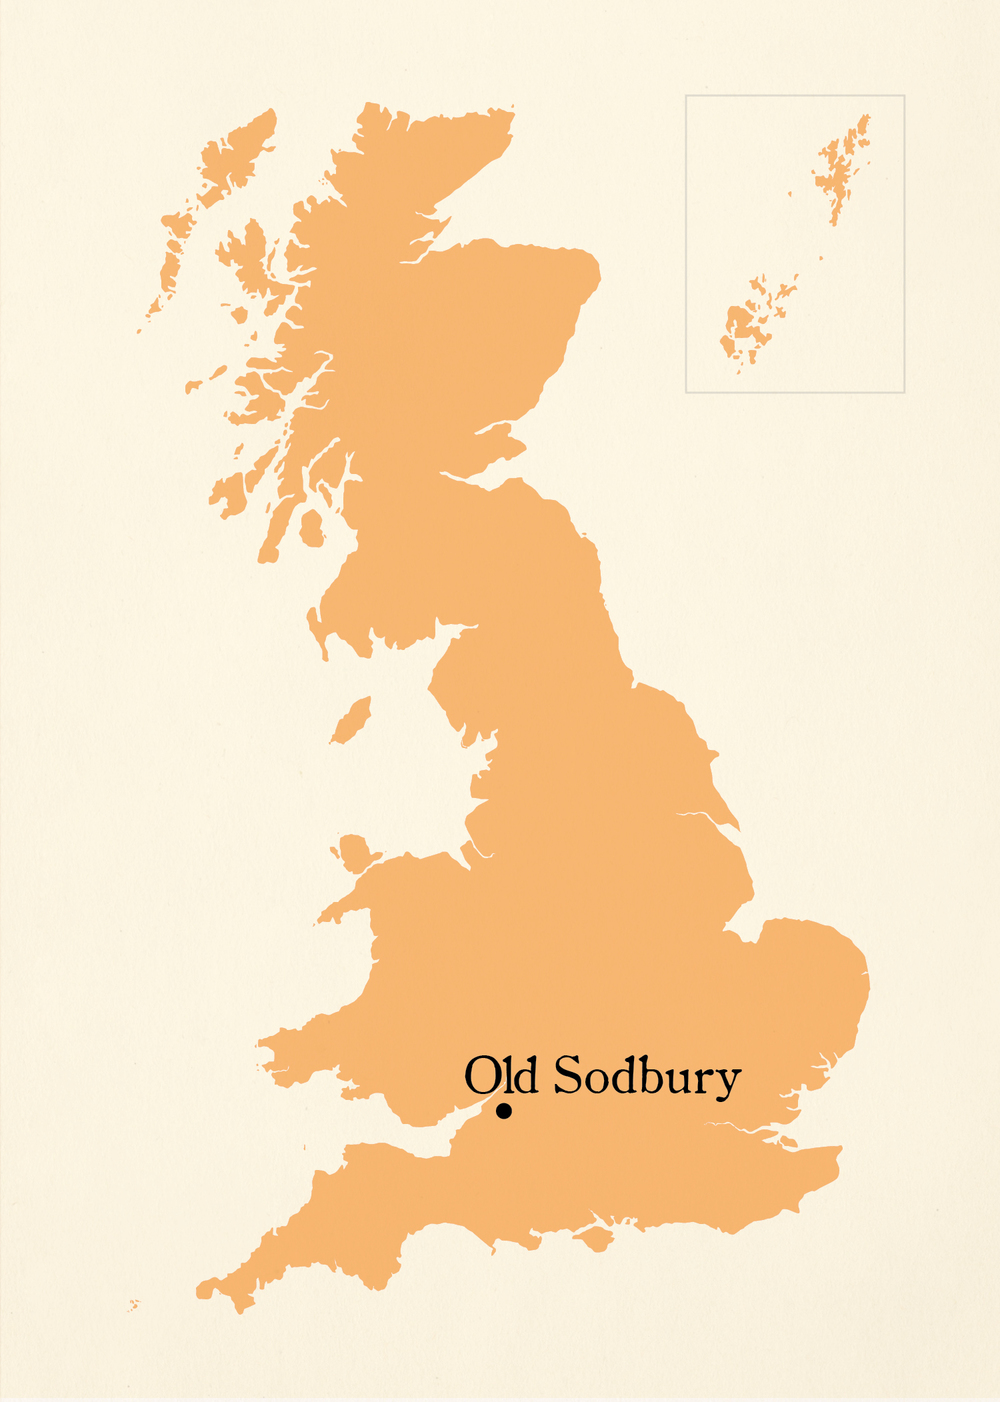 Old Sodbury